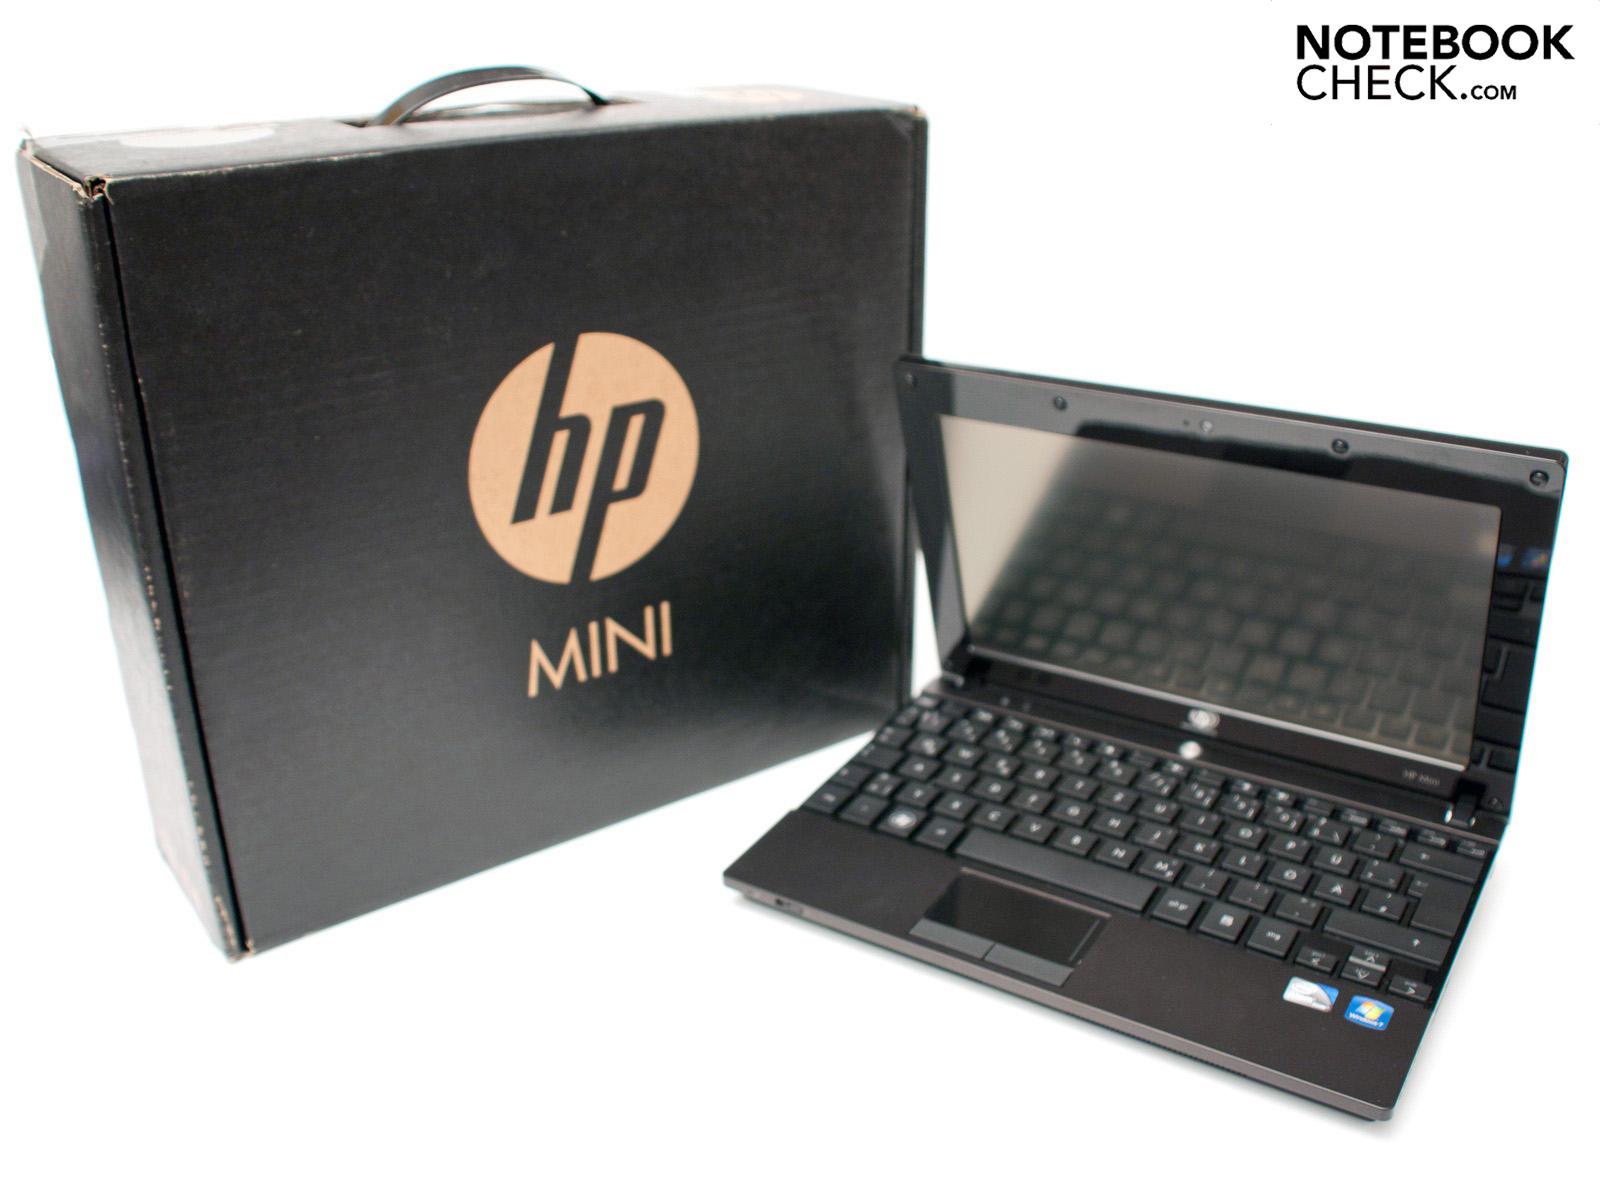 HP Mini 1000 PC Series IDT Audio X64 Driver Download